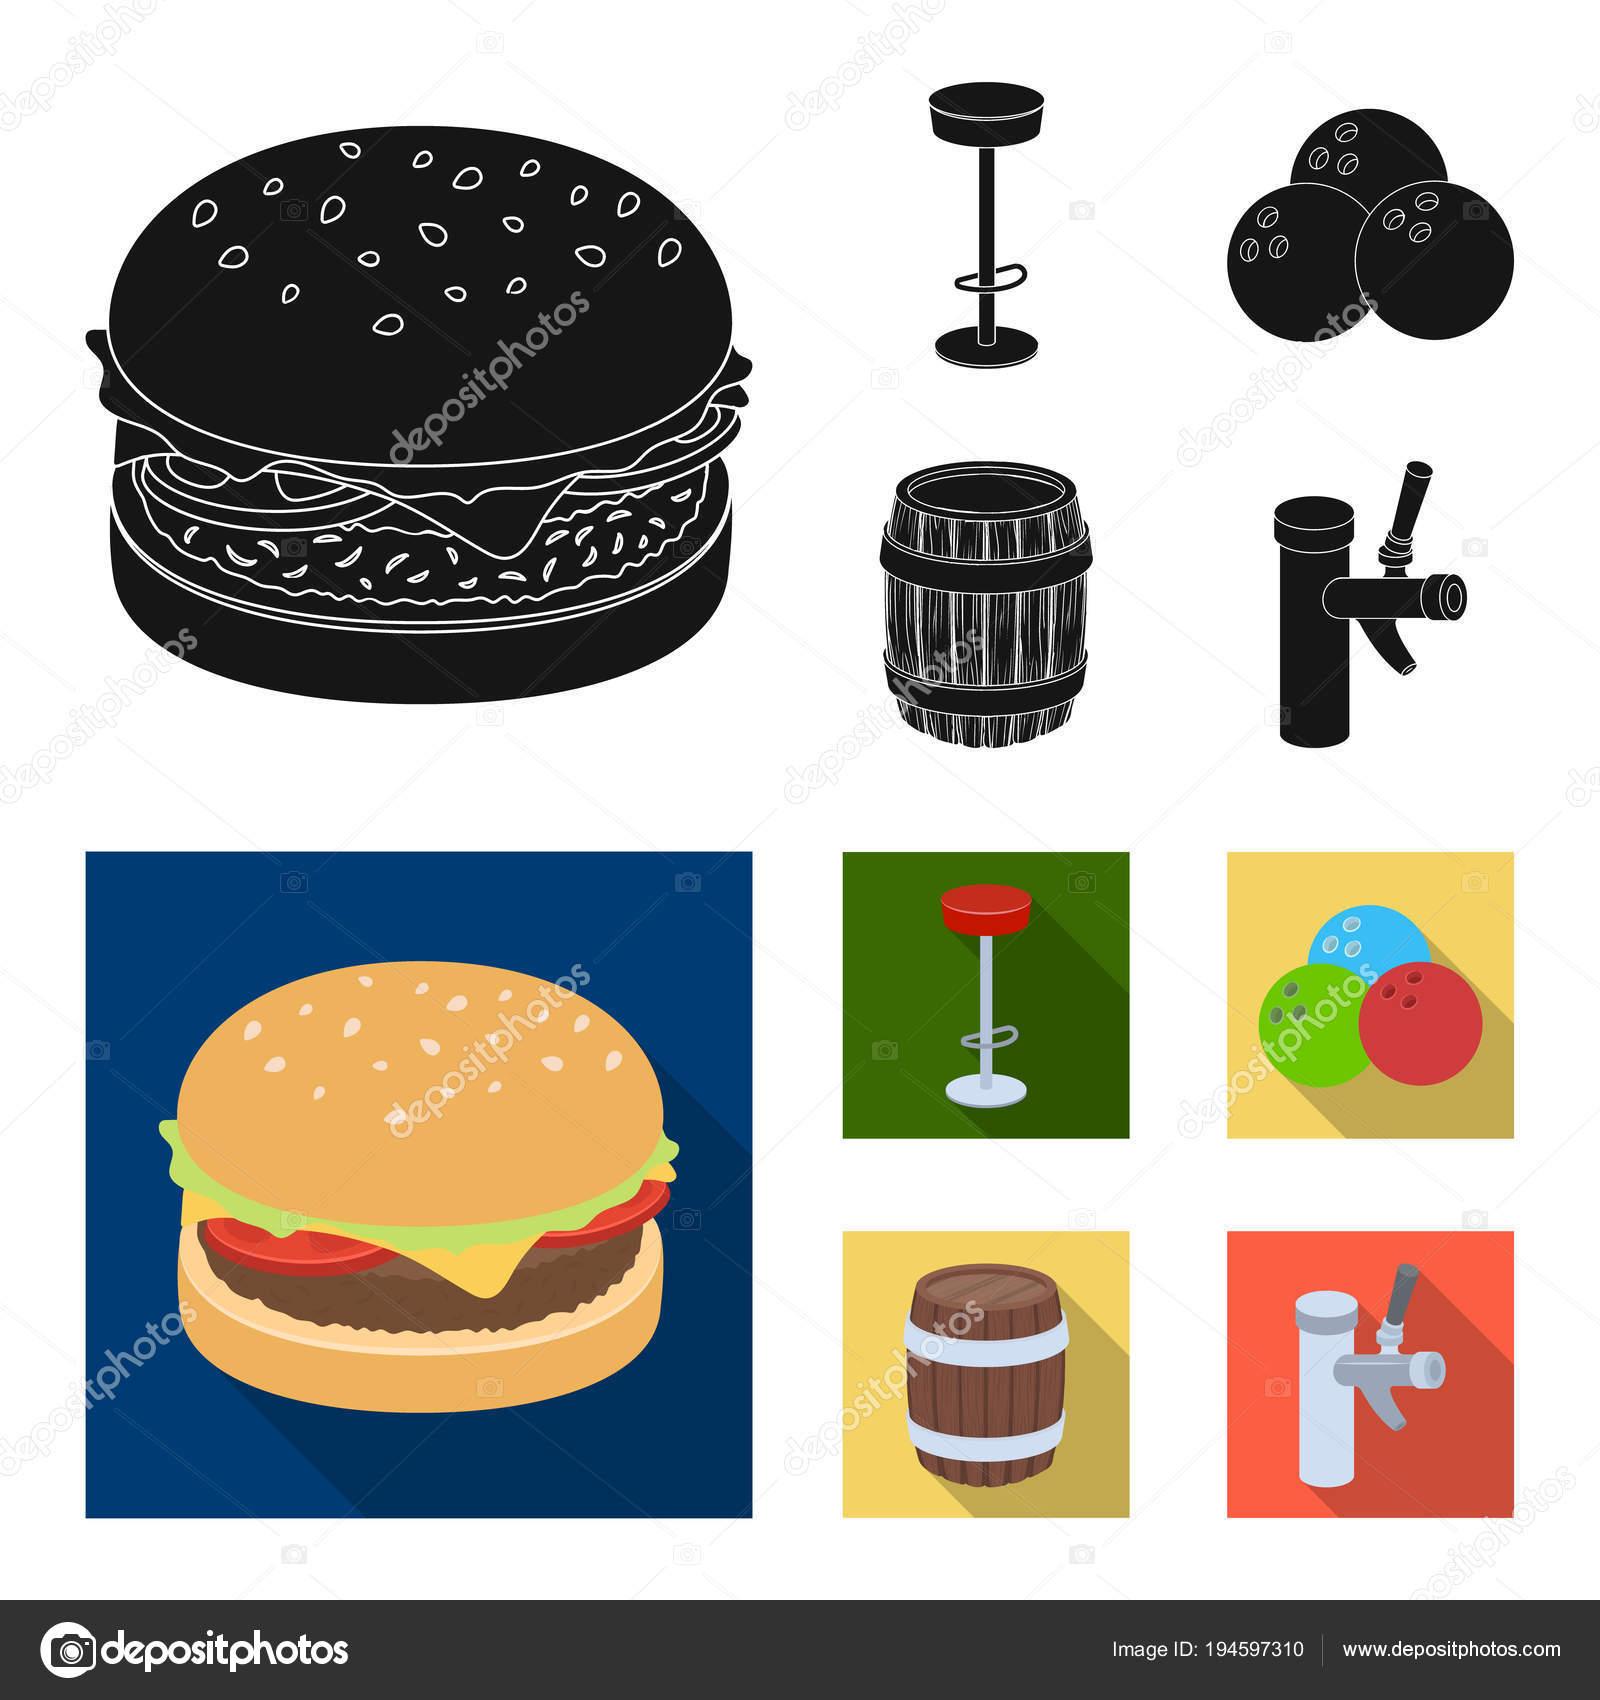 Stellen RestaurantCaféStuhlBowling RestaurantCaféStuhlBowling KugelPub Icons Sammlung ZkXuOiP